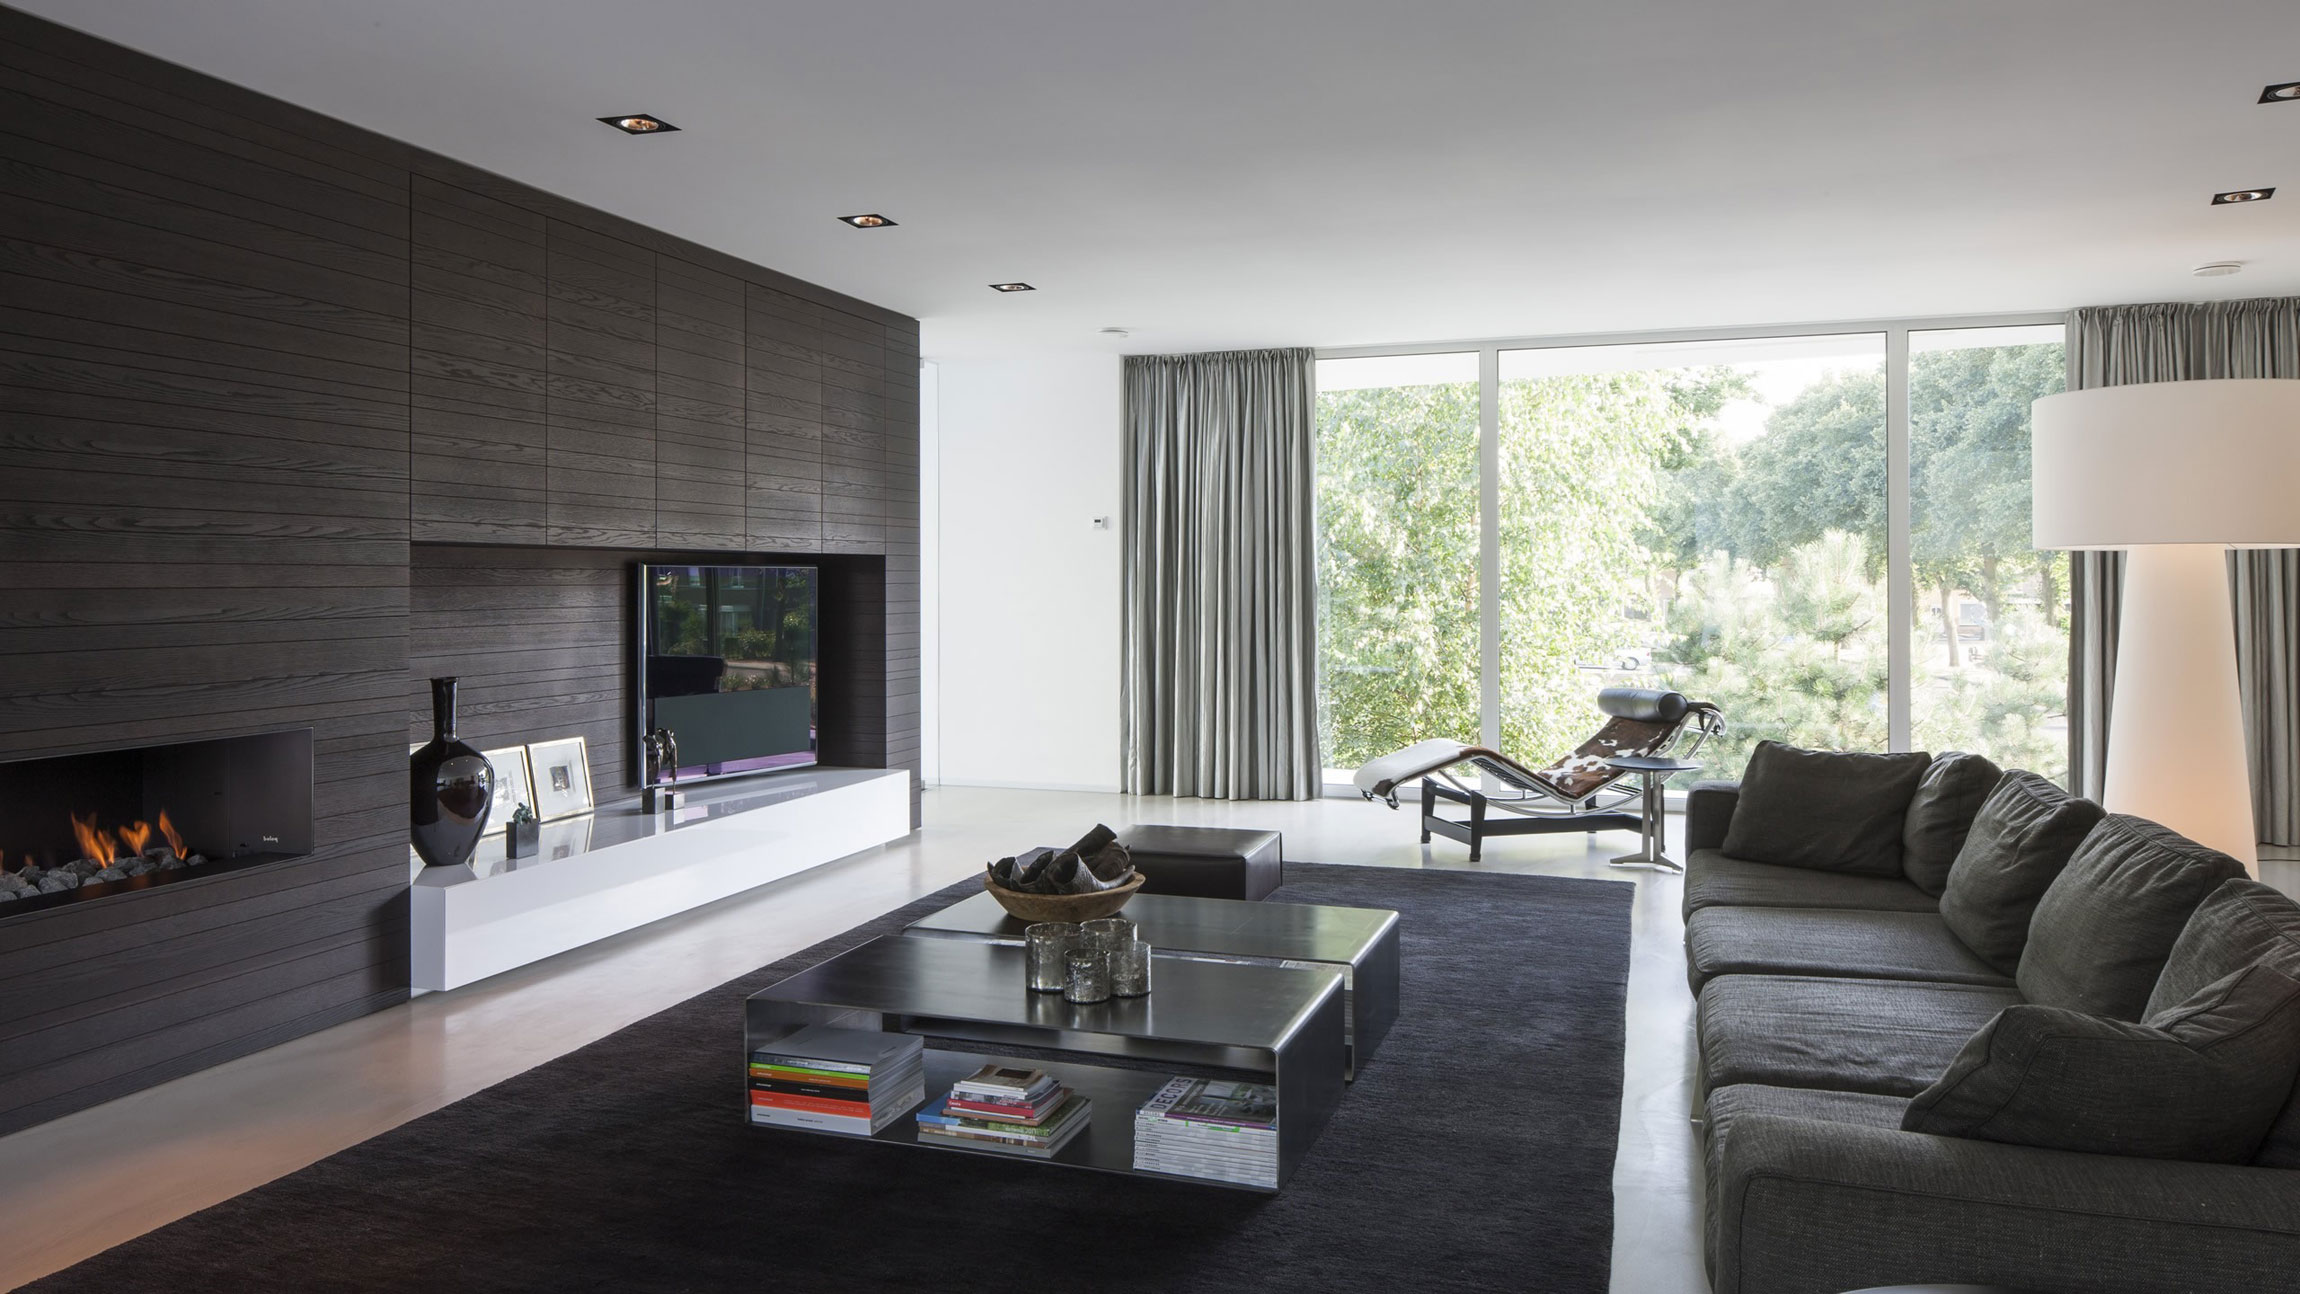 Boxed Villa Spee Haelen with Panoramic Windows by Lab32 architecten-16